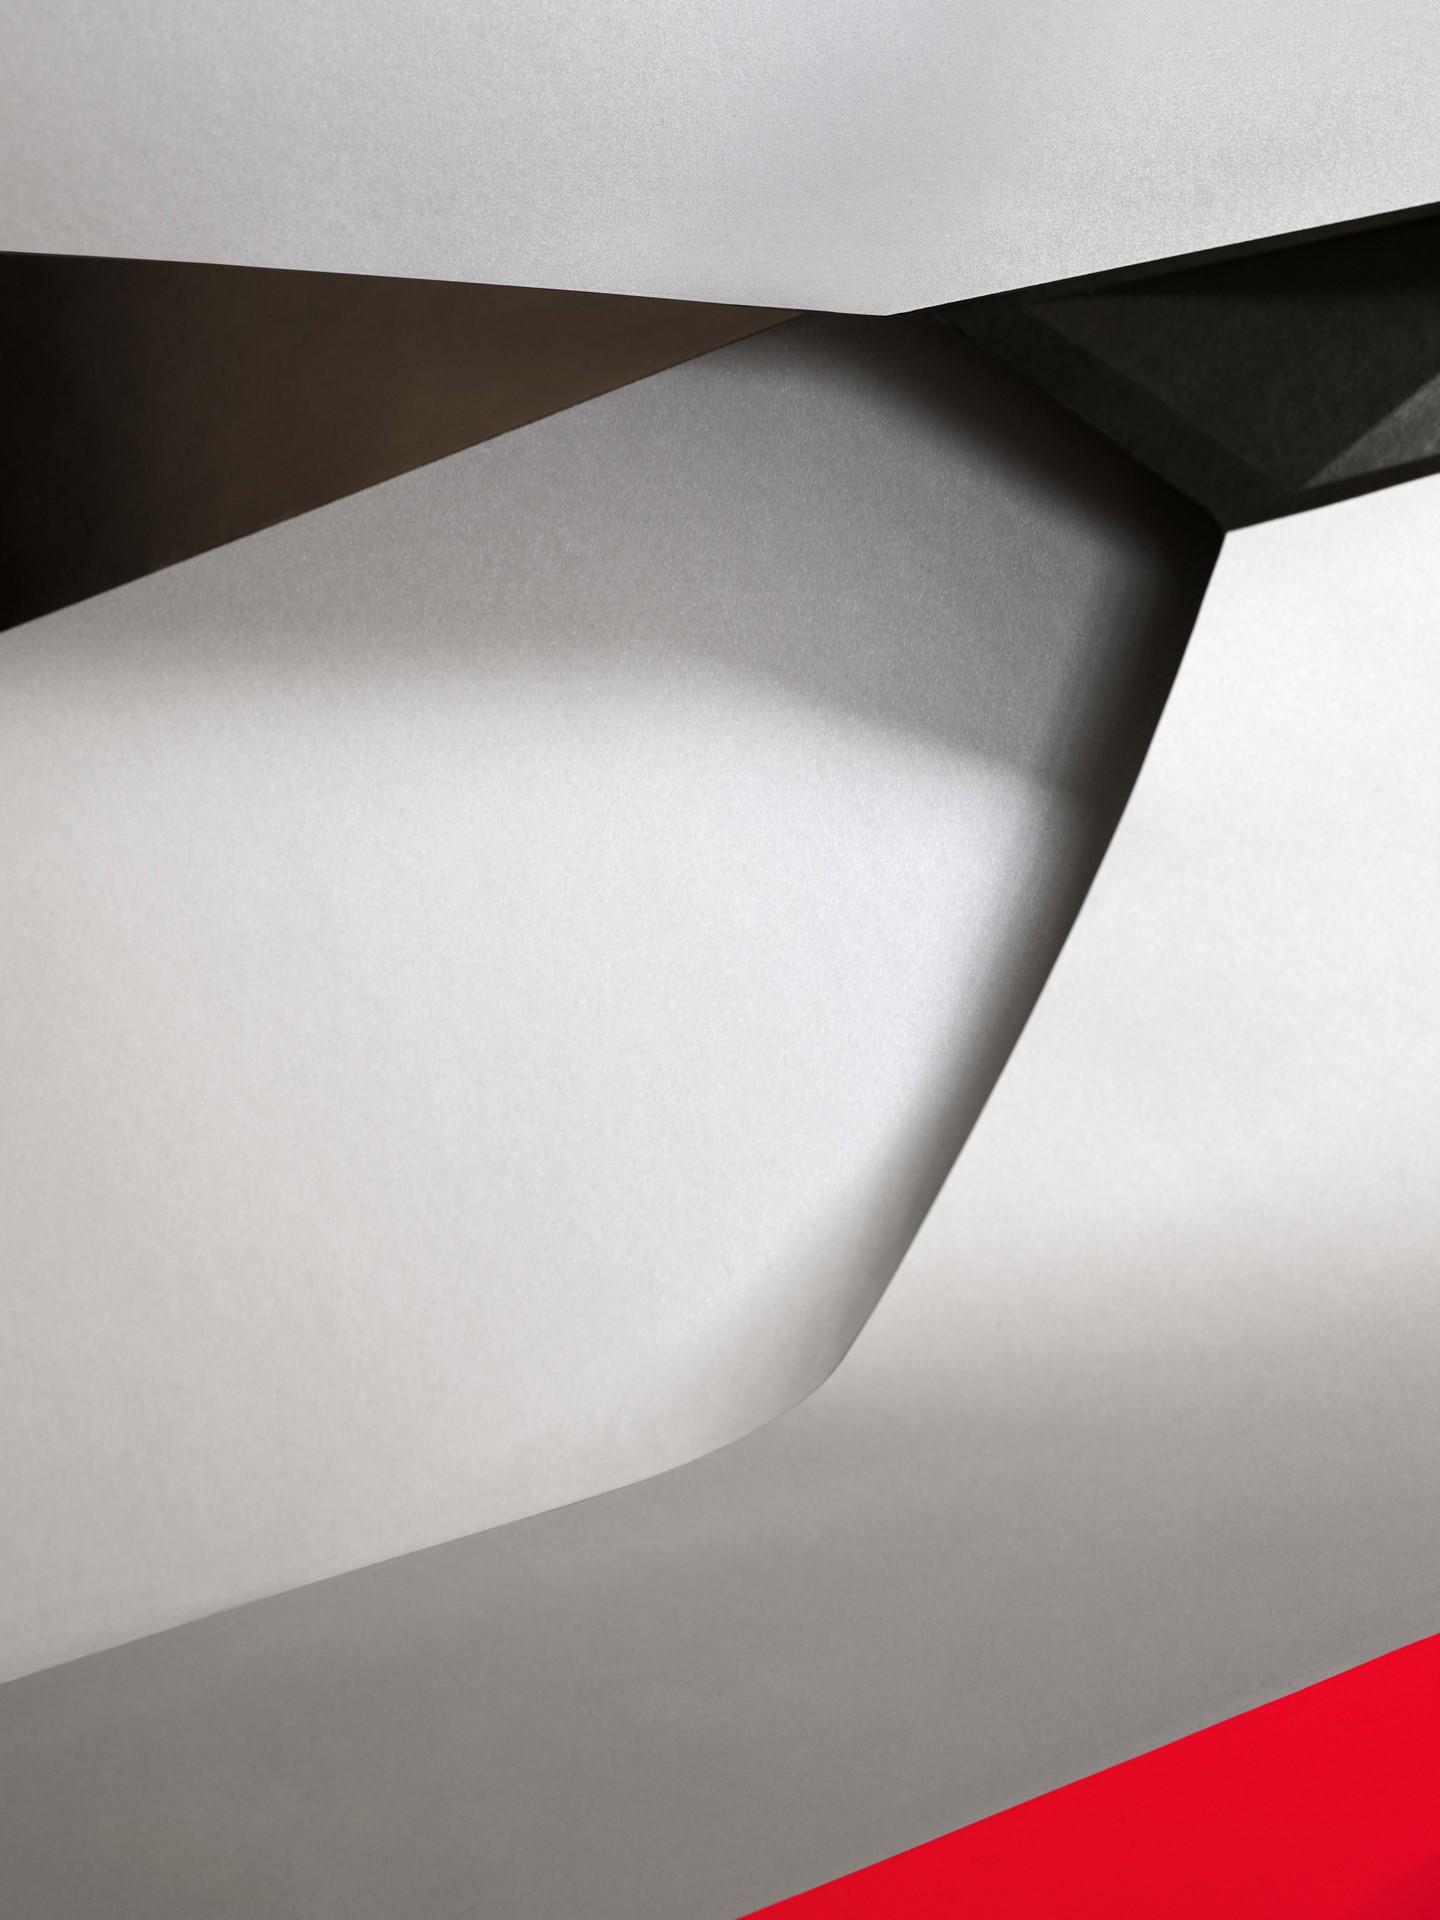 BMW-Vision-M-Next-Concept-teasers-3